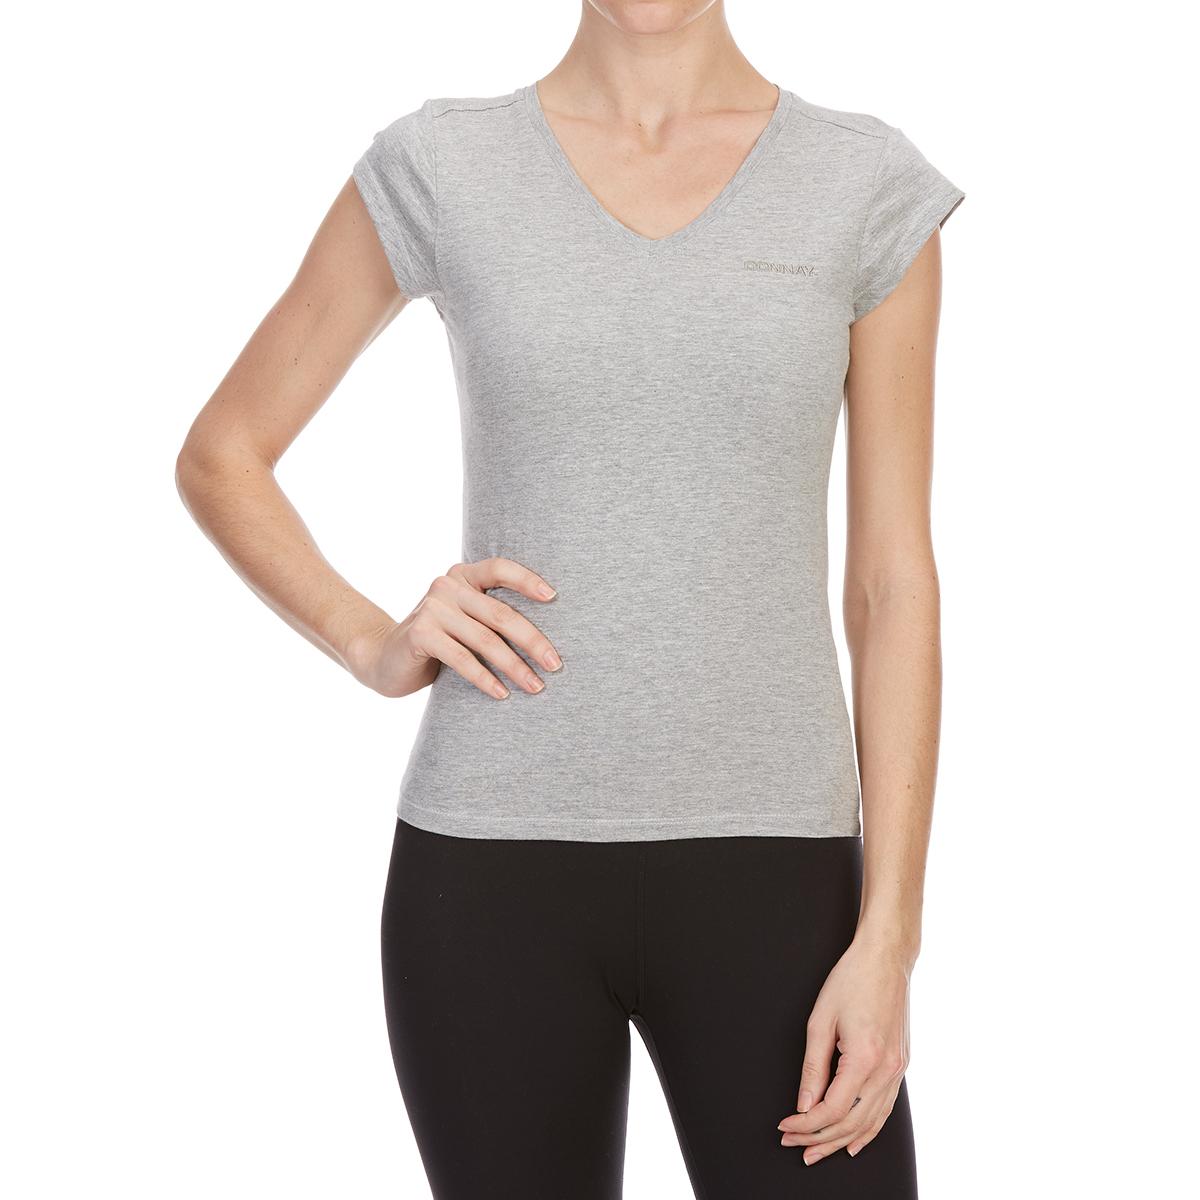 Donnay Women's V-Neck Short-Sleeve Tee - Black, 12